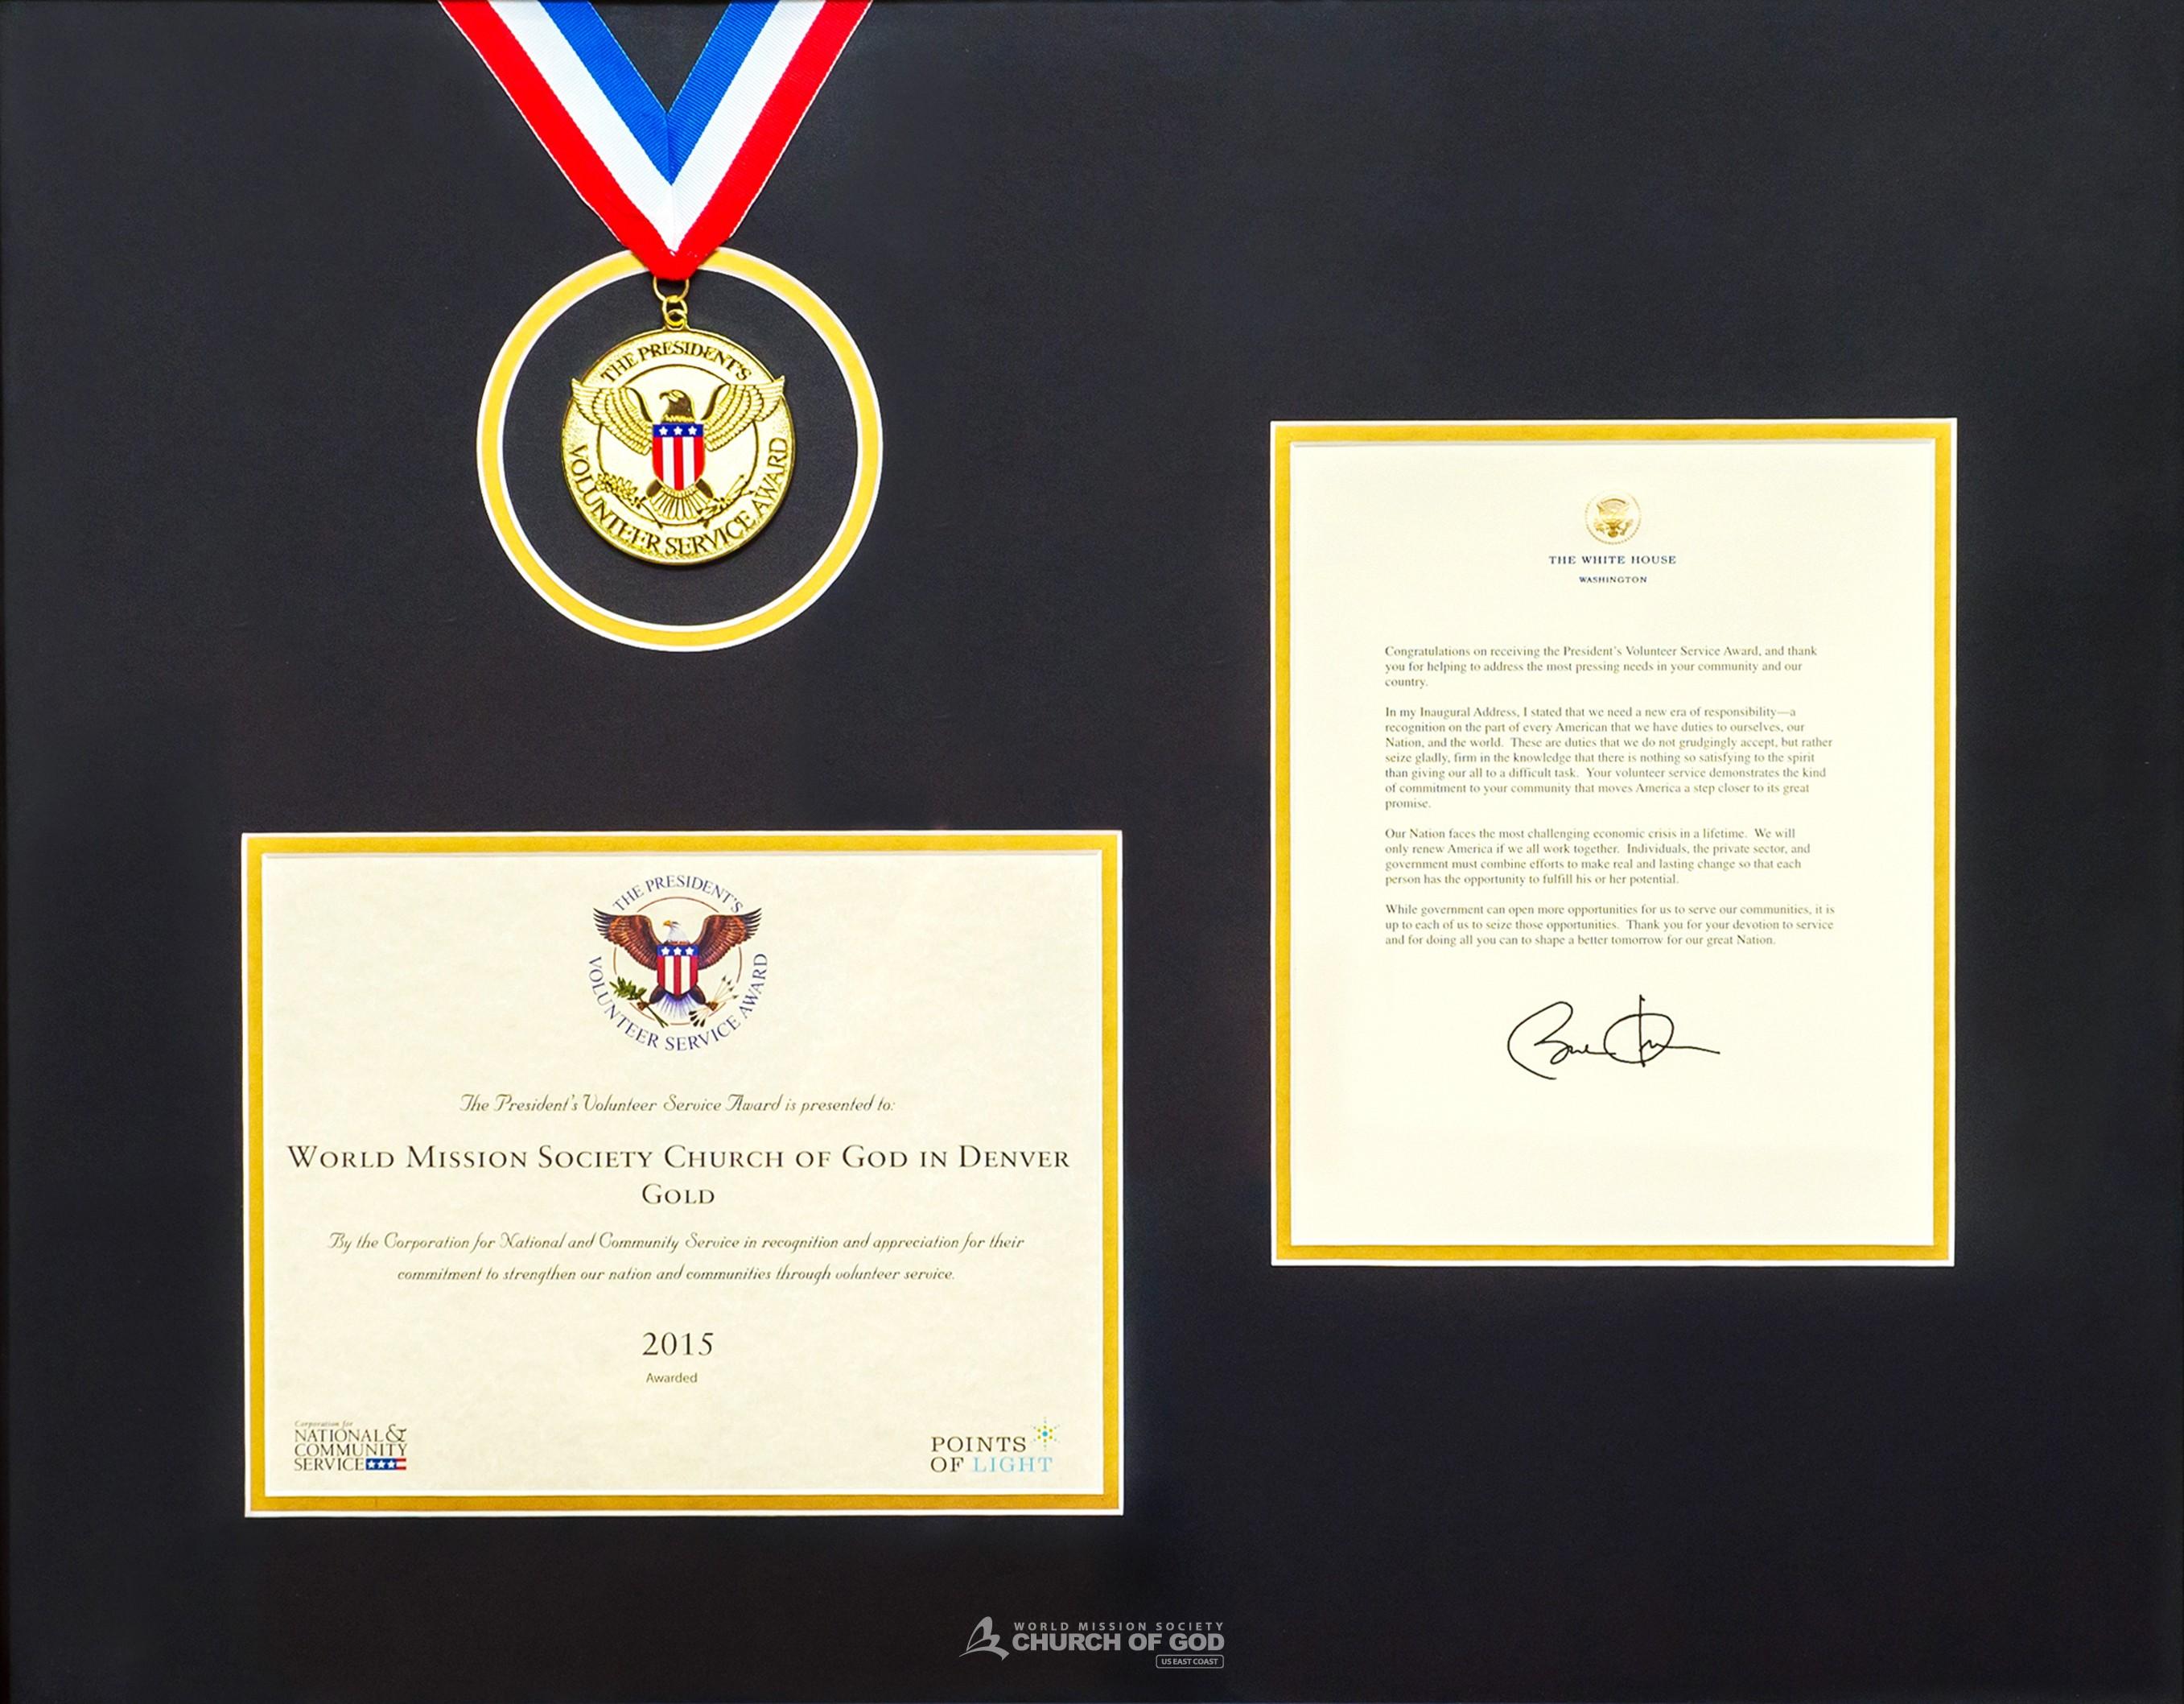 world mission society church of god, church of god in denver, presidents call to service award, volunteer award, 2015